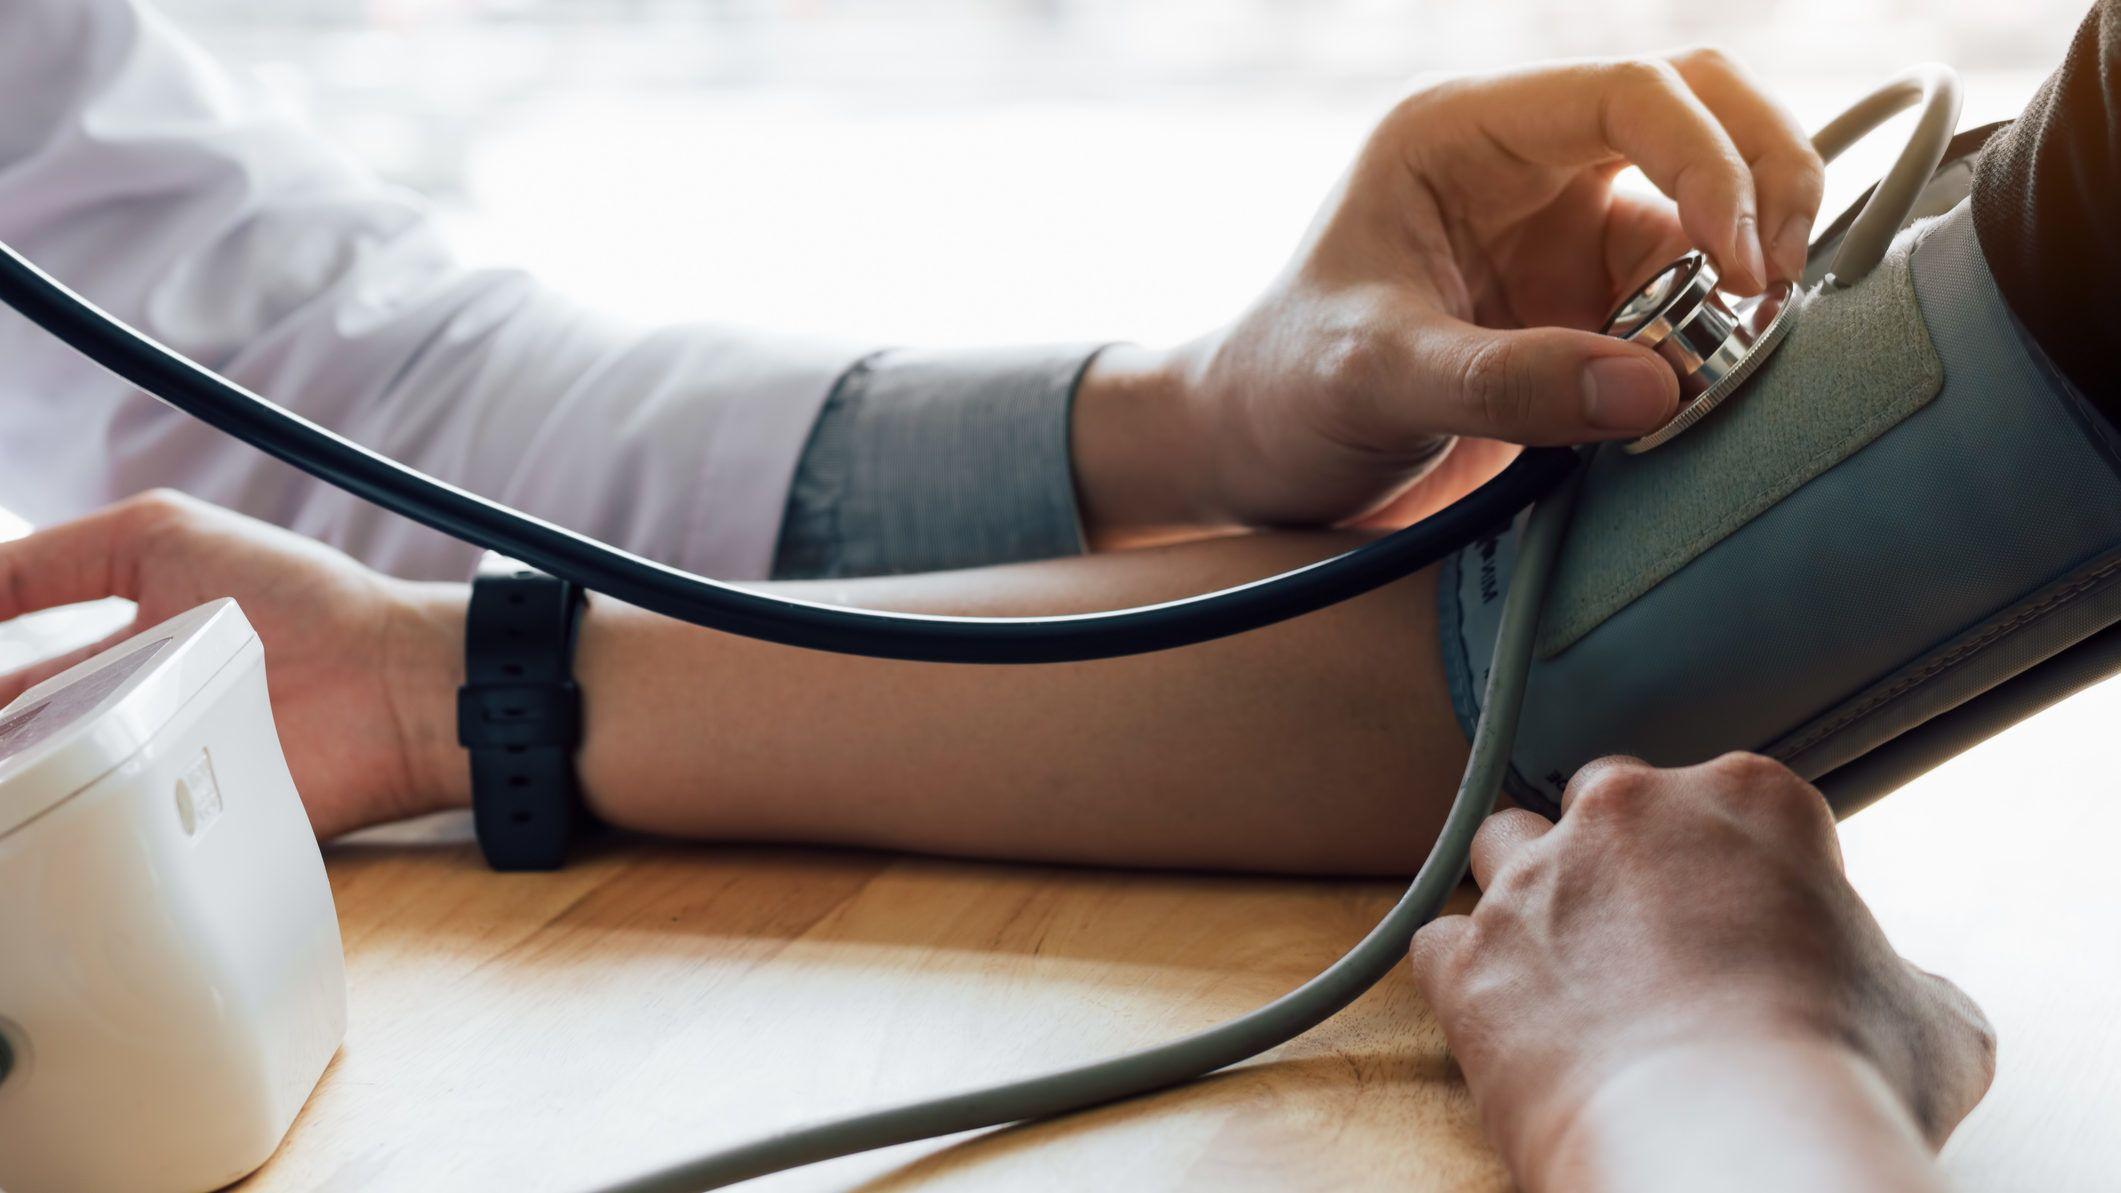 Magas vérnyomás, aki felfedezte